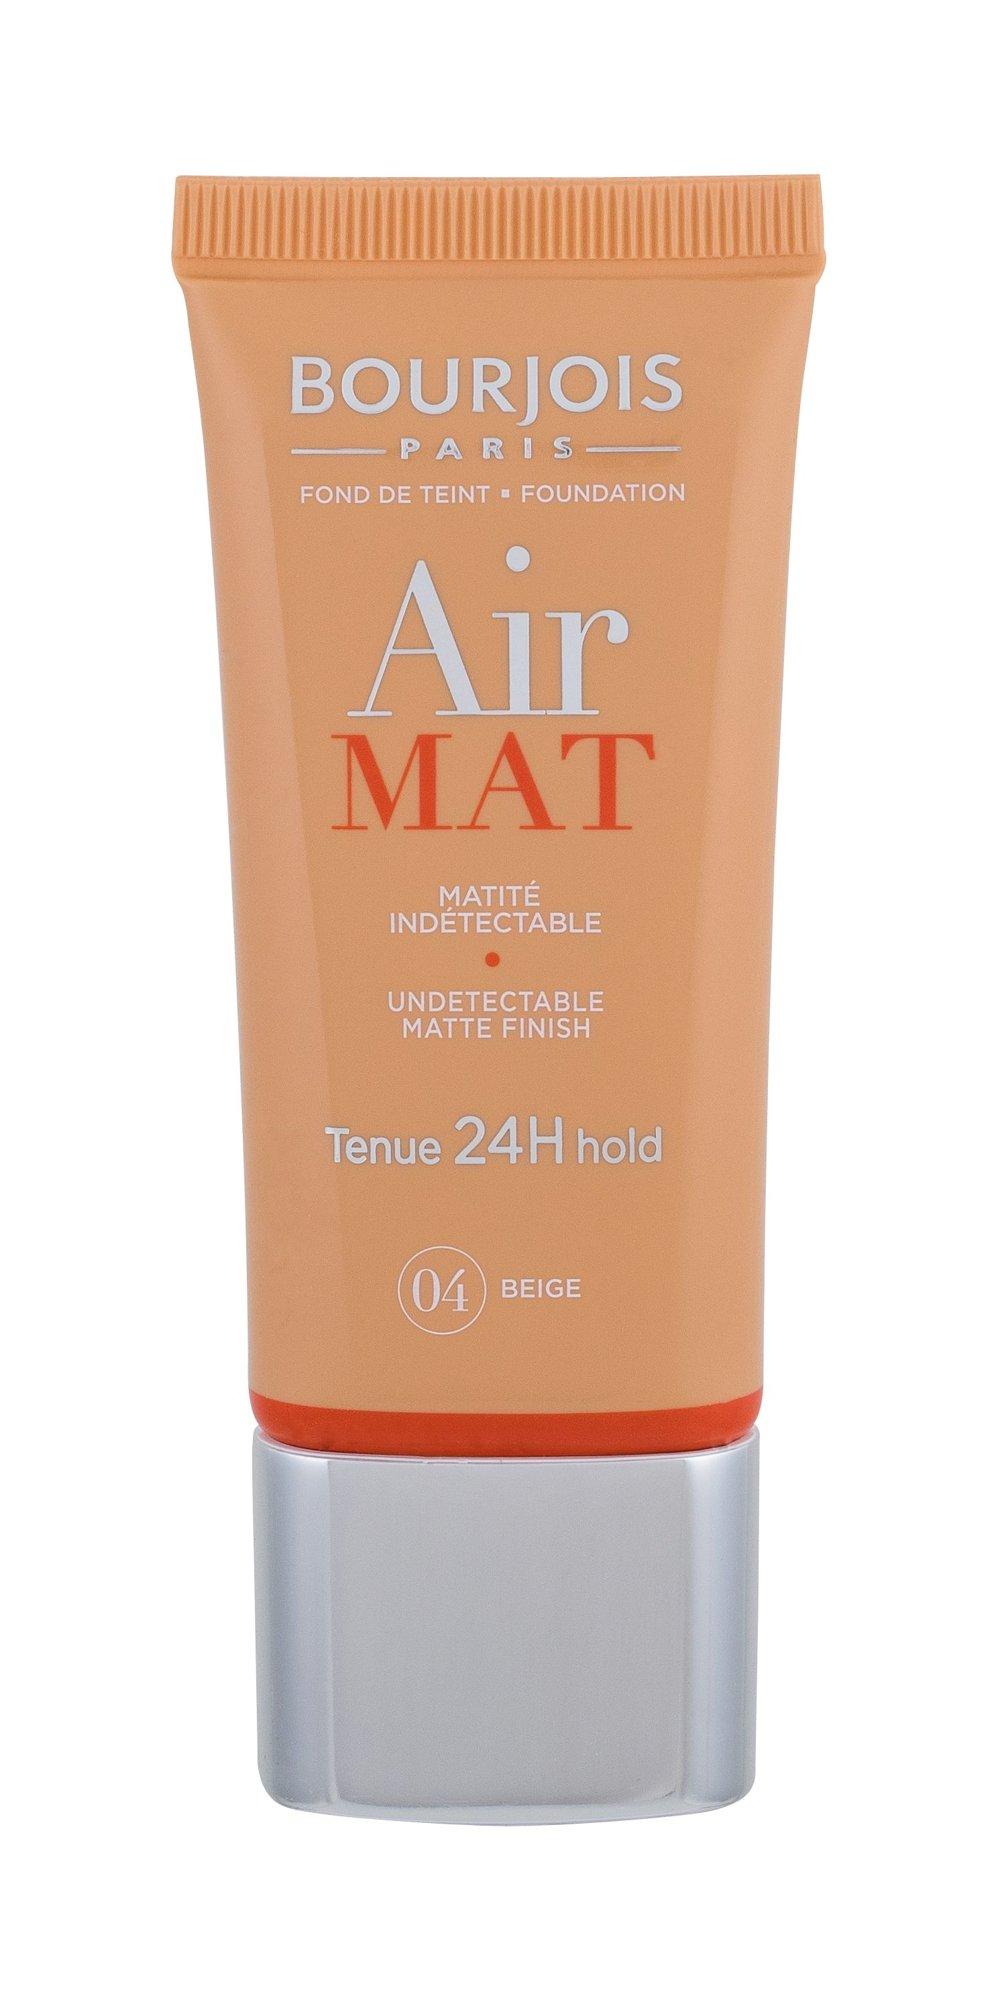 BOURJOIS Paris Air Mat Cosmetic 30ml 04 Beige